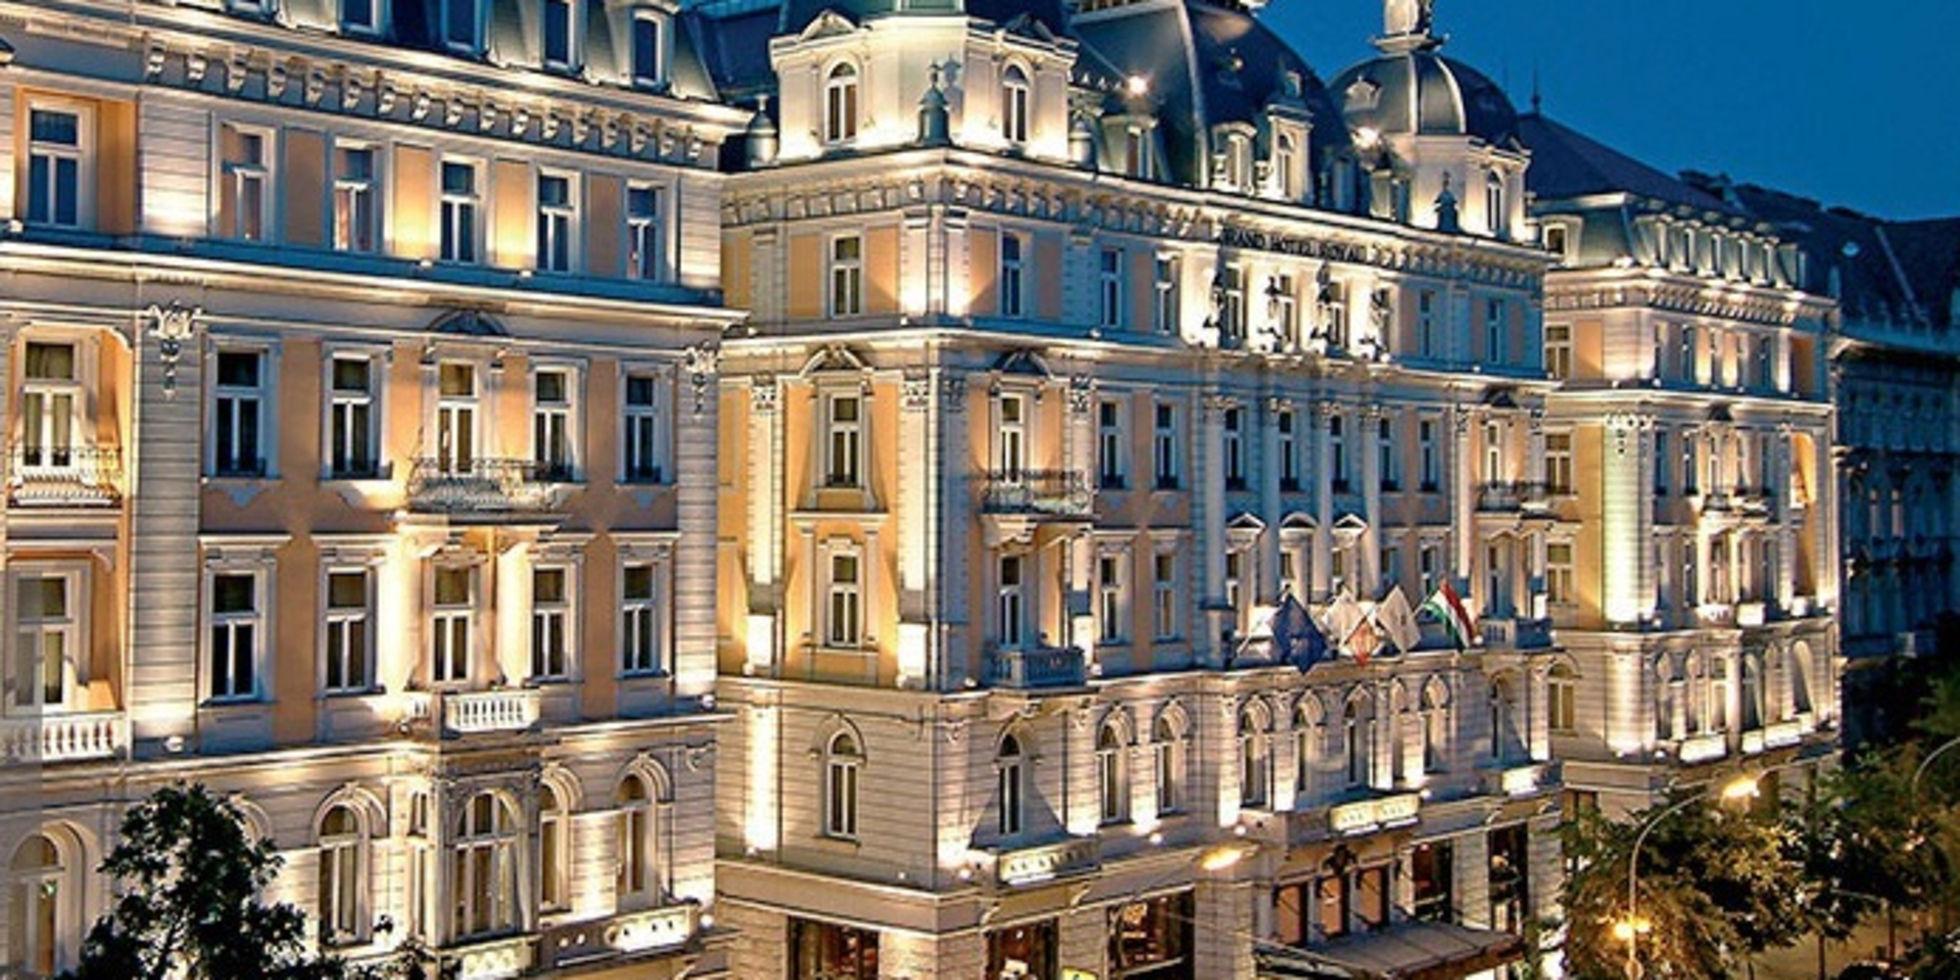 Marketing Idee Hotel Wirbt Mit The Grand Budapest Hotel Film Package